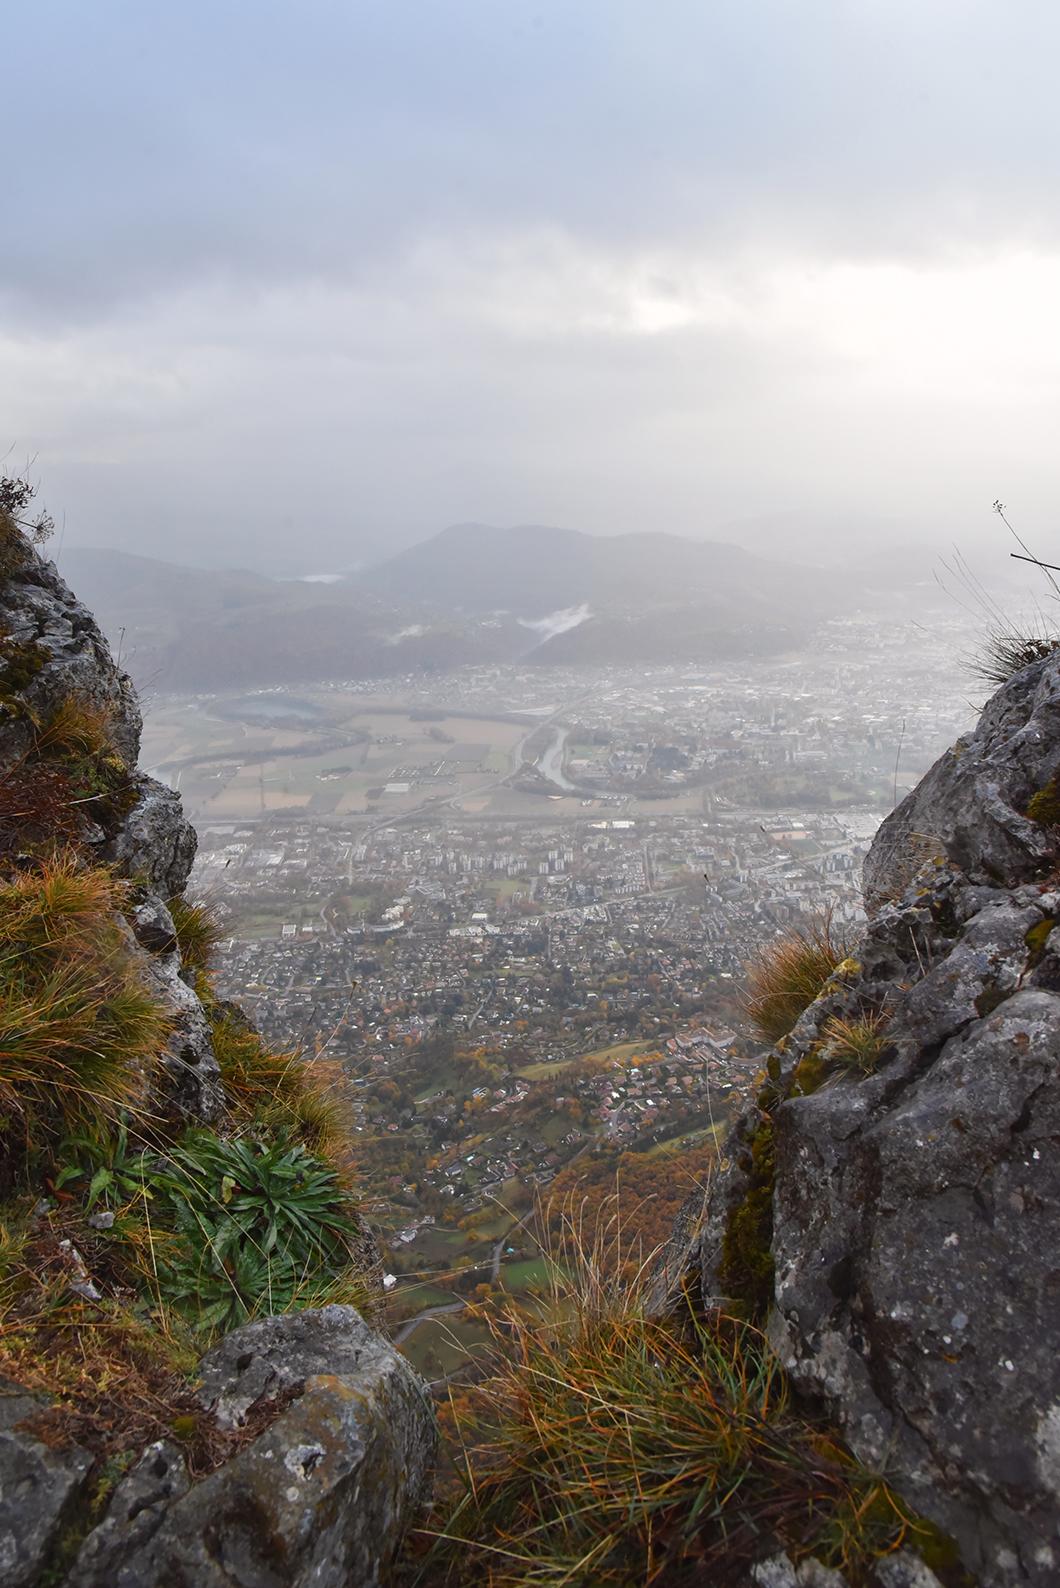 Vue sur Grenoble - Fort du Saint-Eynard